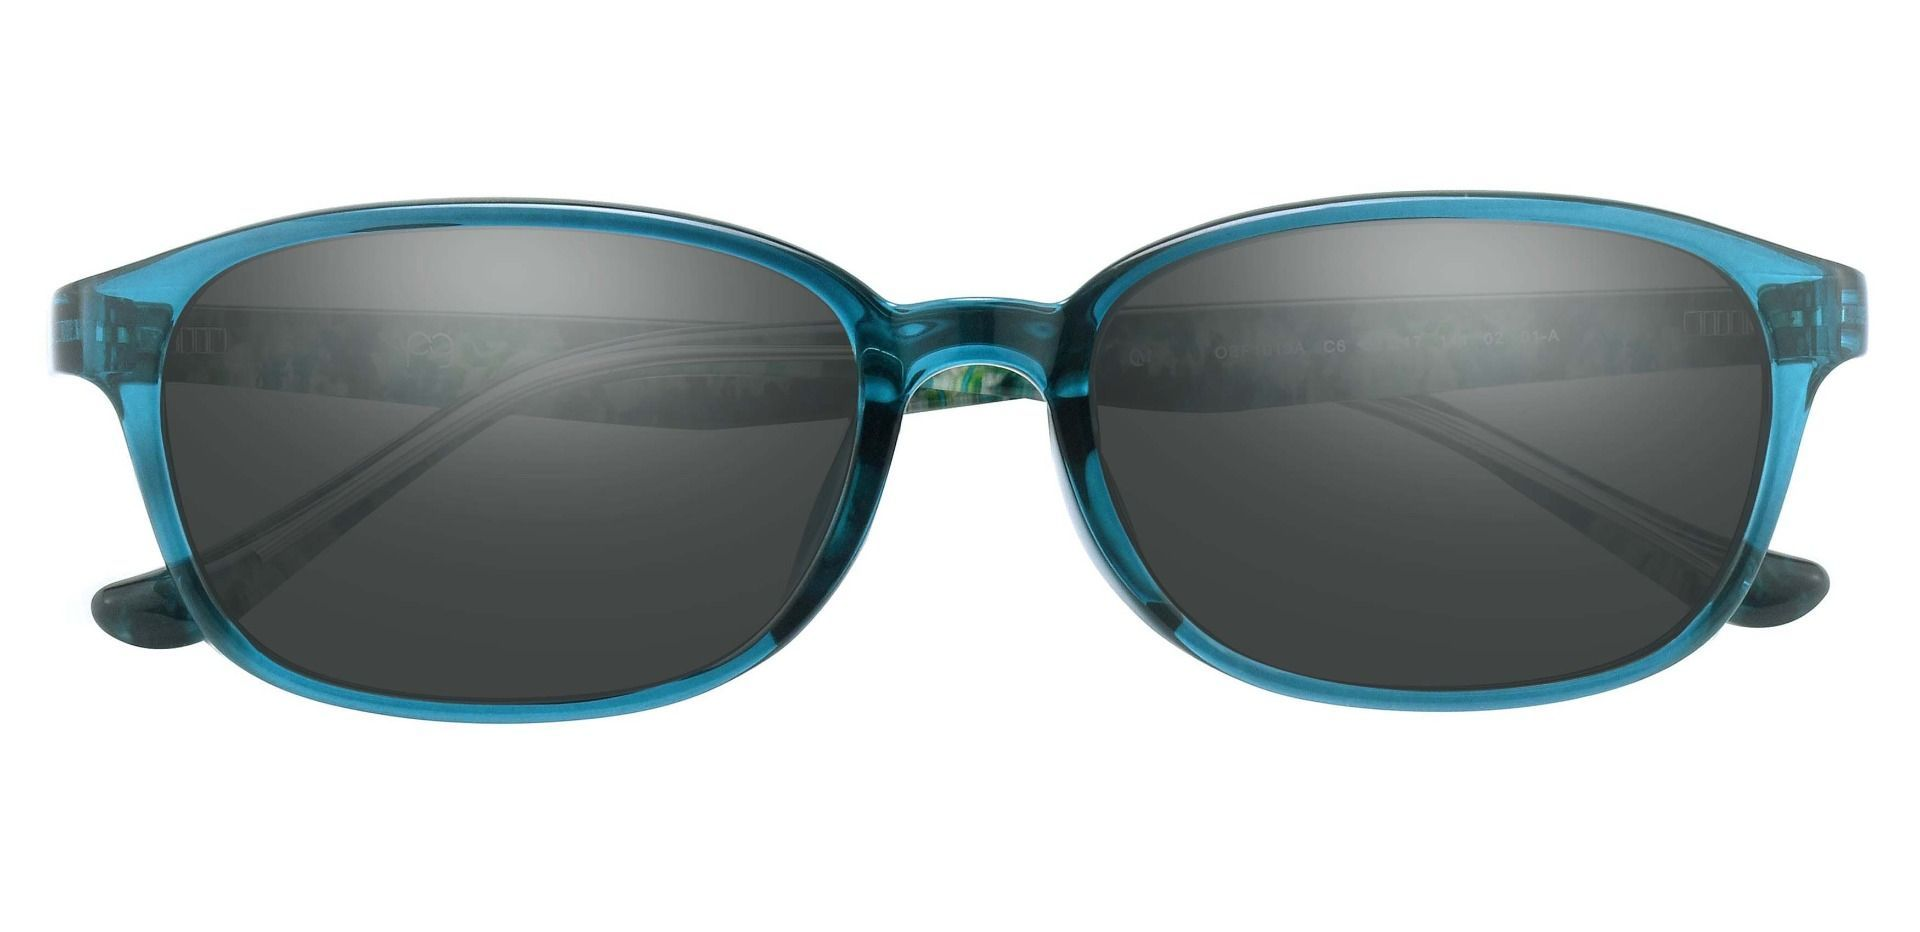 Hemingway Oval Prescription Sunglasses - Blue Frame With Gray Lenses